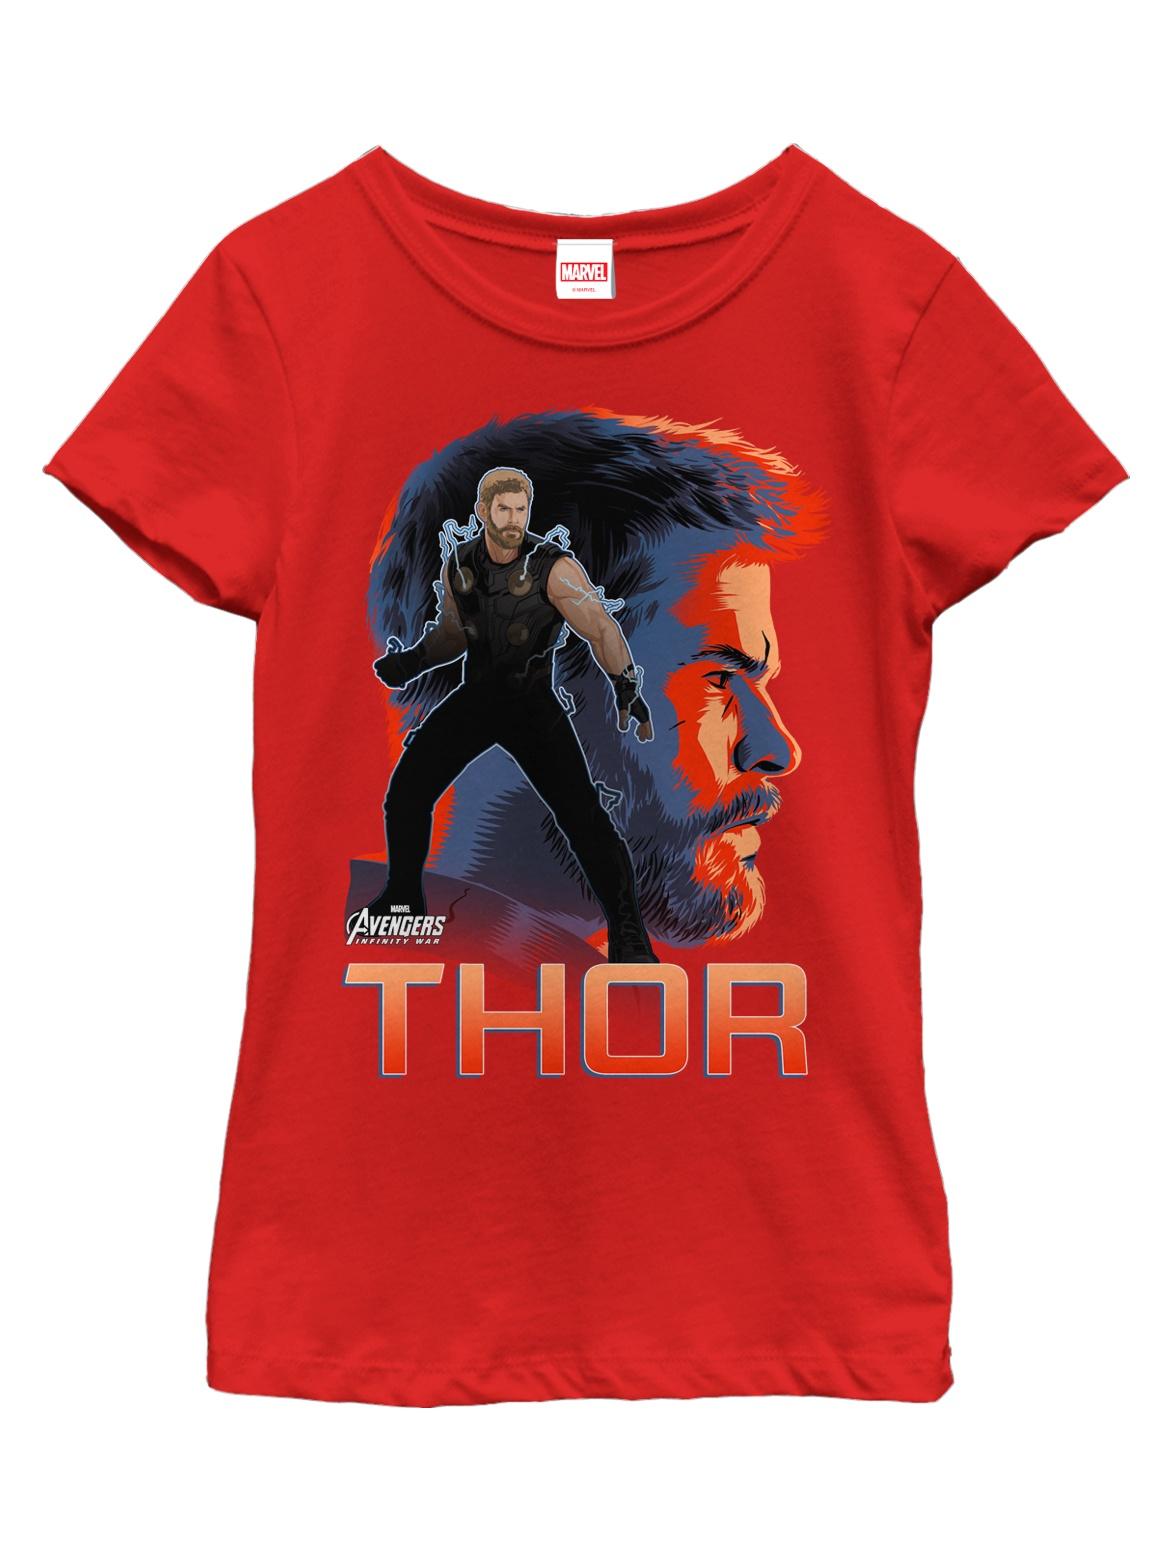 Marvel Girls' Avengers: Infinity War Thor View T-Shirt